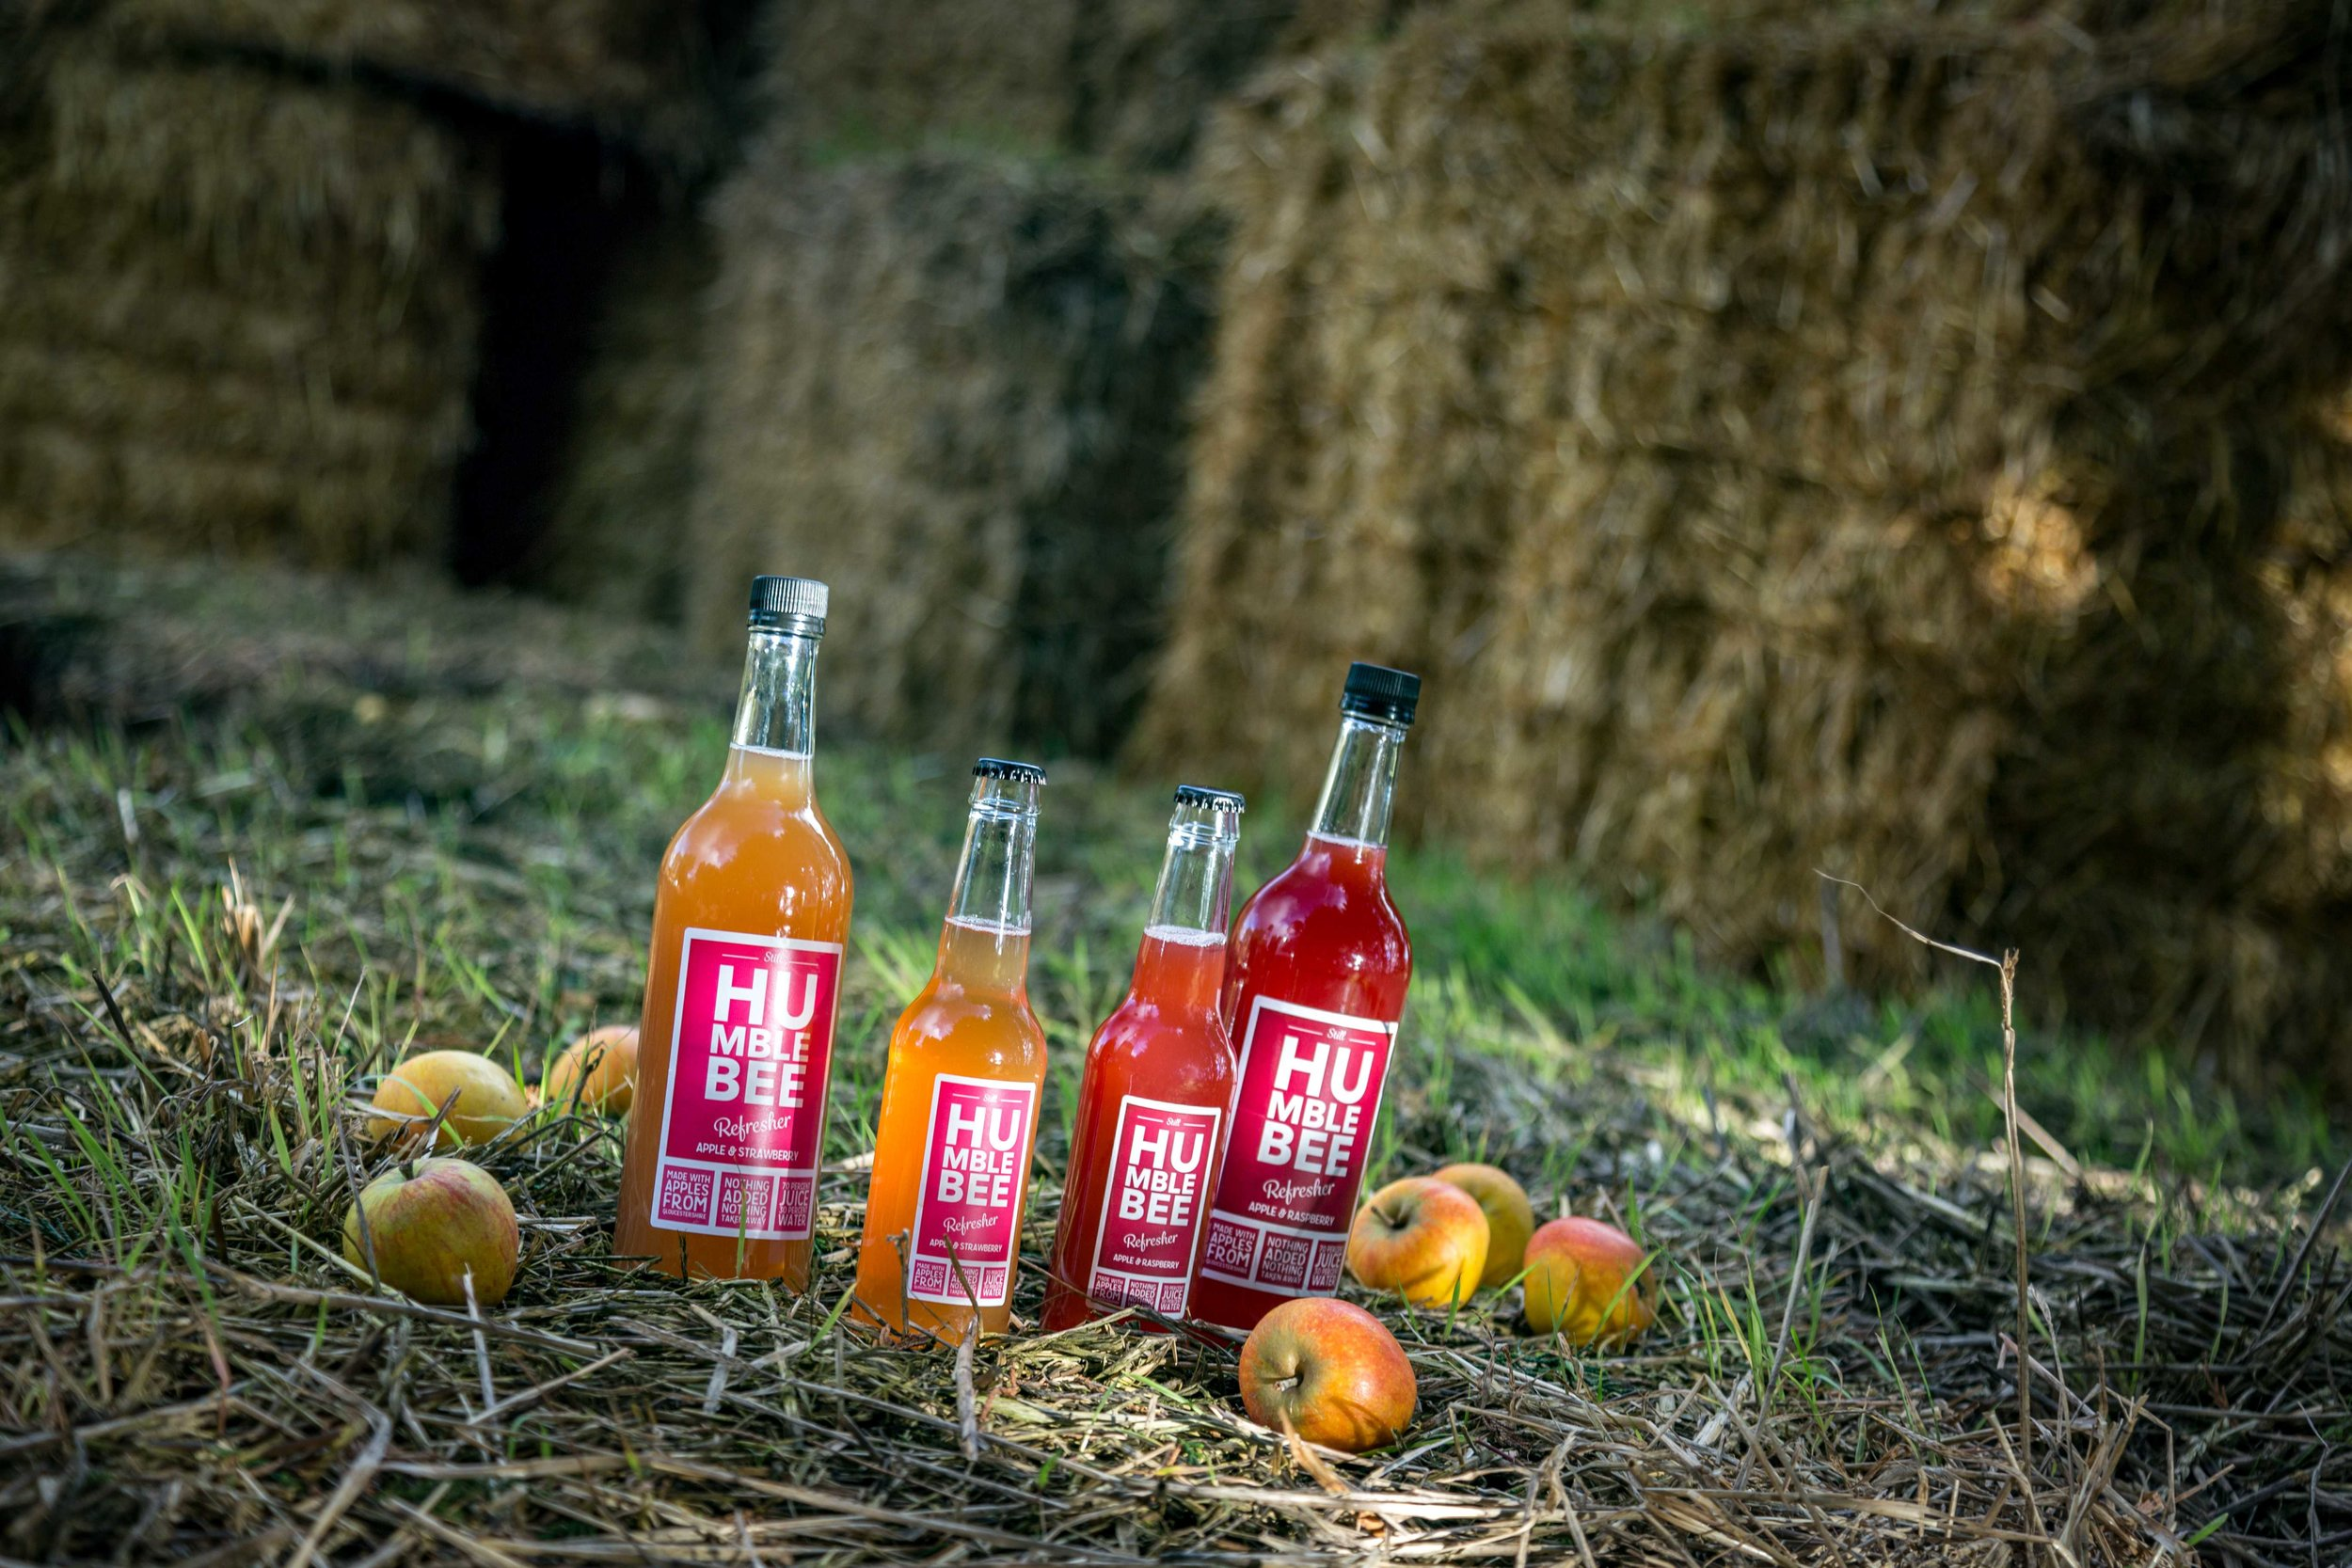 Humblebee Refresher Brand 4 dappled straw with apples v2.jpg